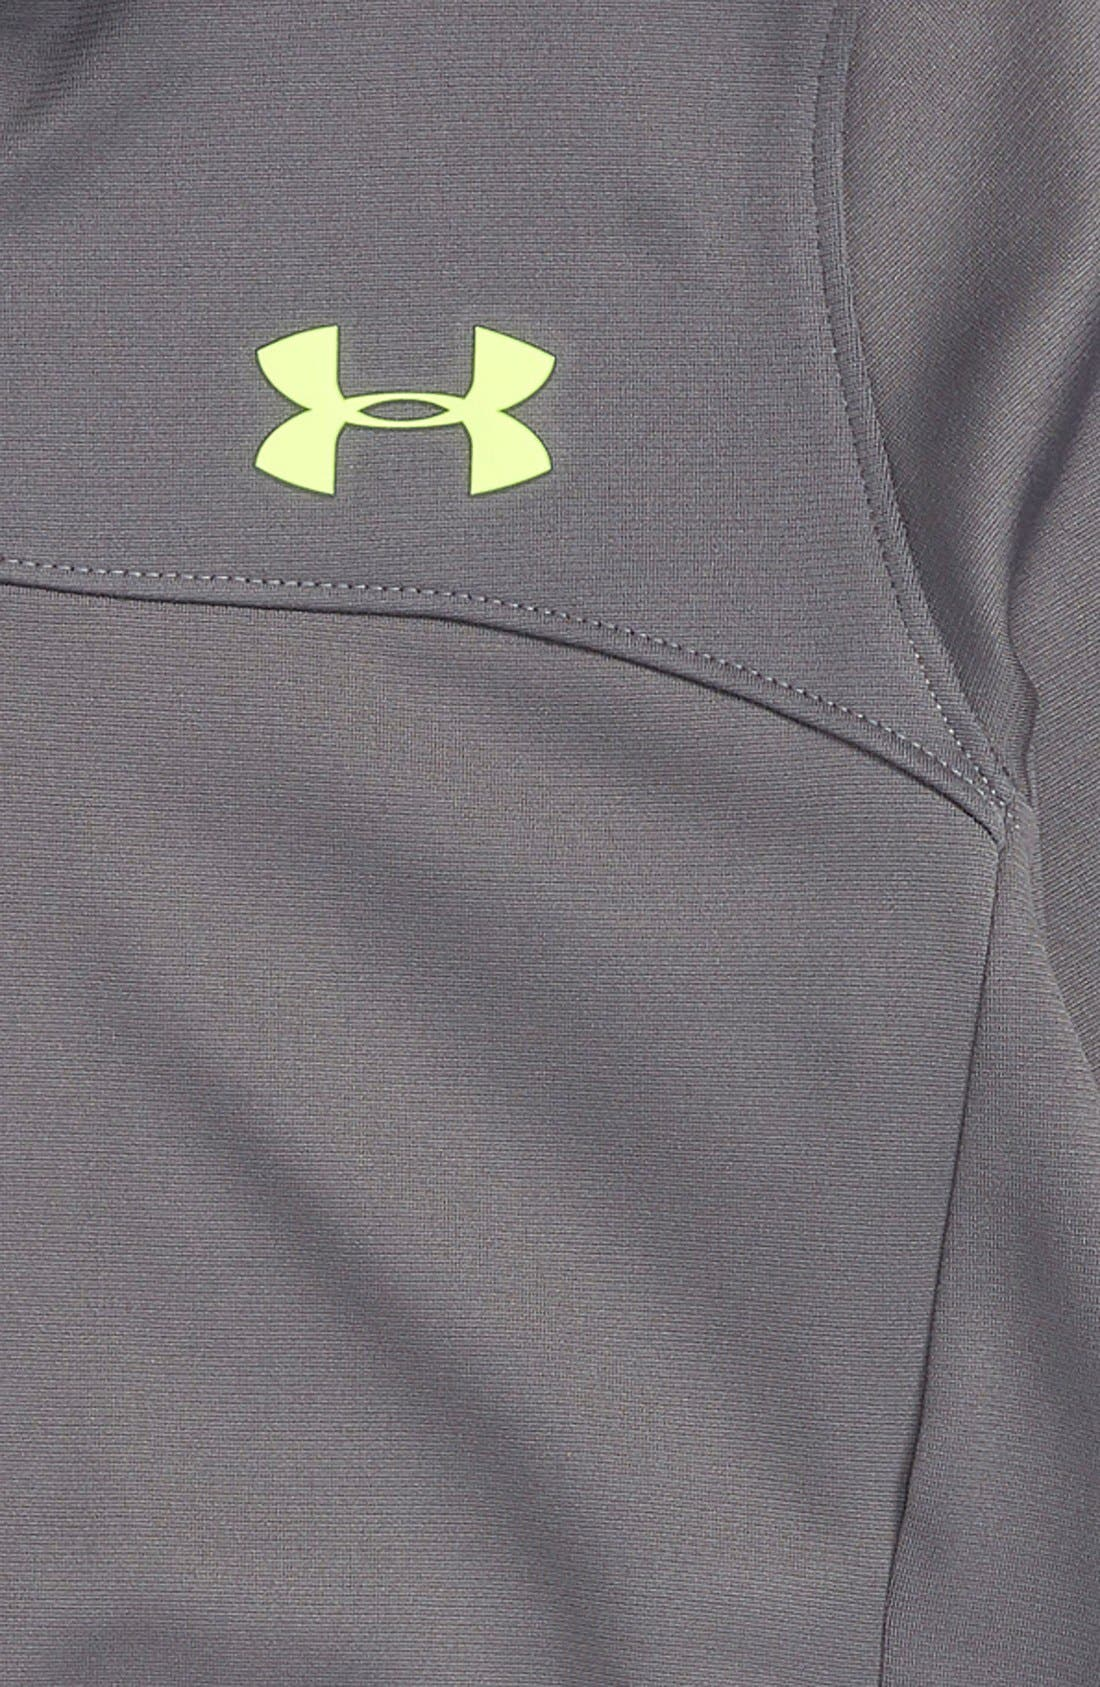 'Pennant' Warm Up Jacket,                             Alternate thumbnail 14, color,